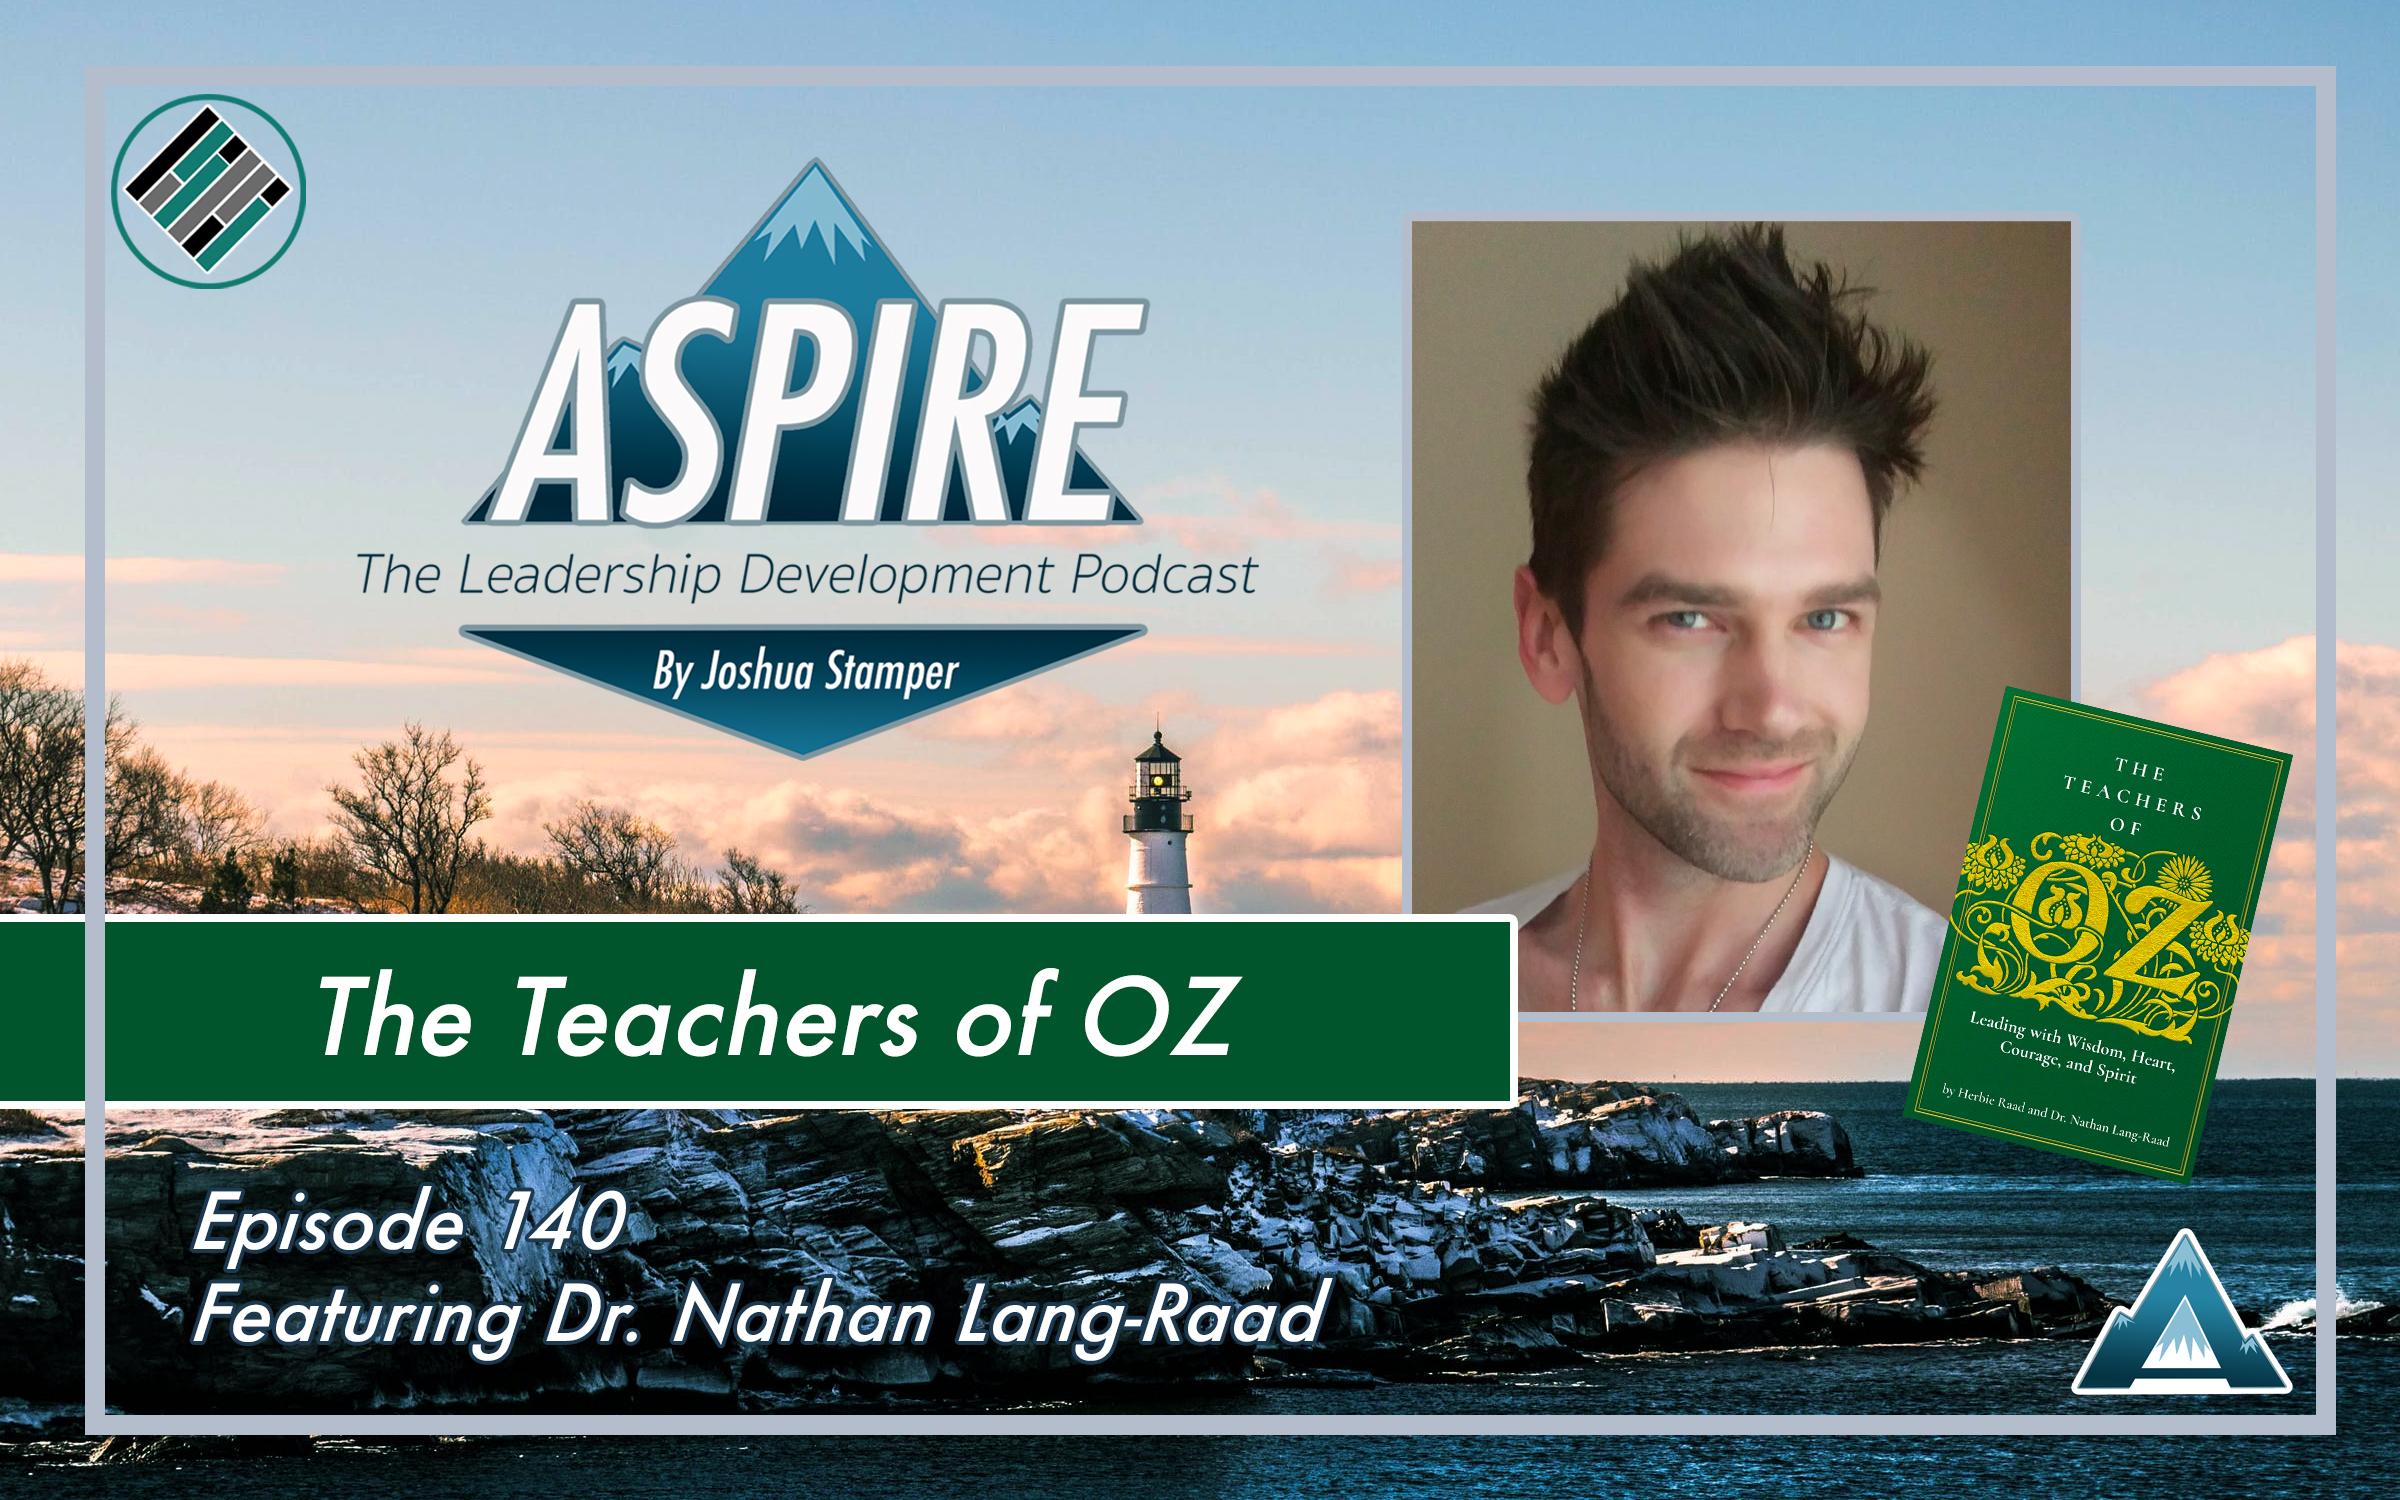 Joshua Stamper, Aspire: The Leadership Development Podcast, Nathan Lang Raad, The teachers of OZ, #AspireLead